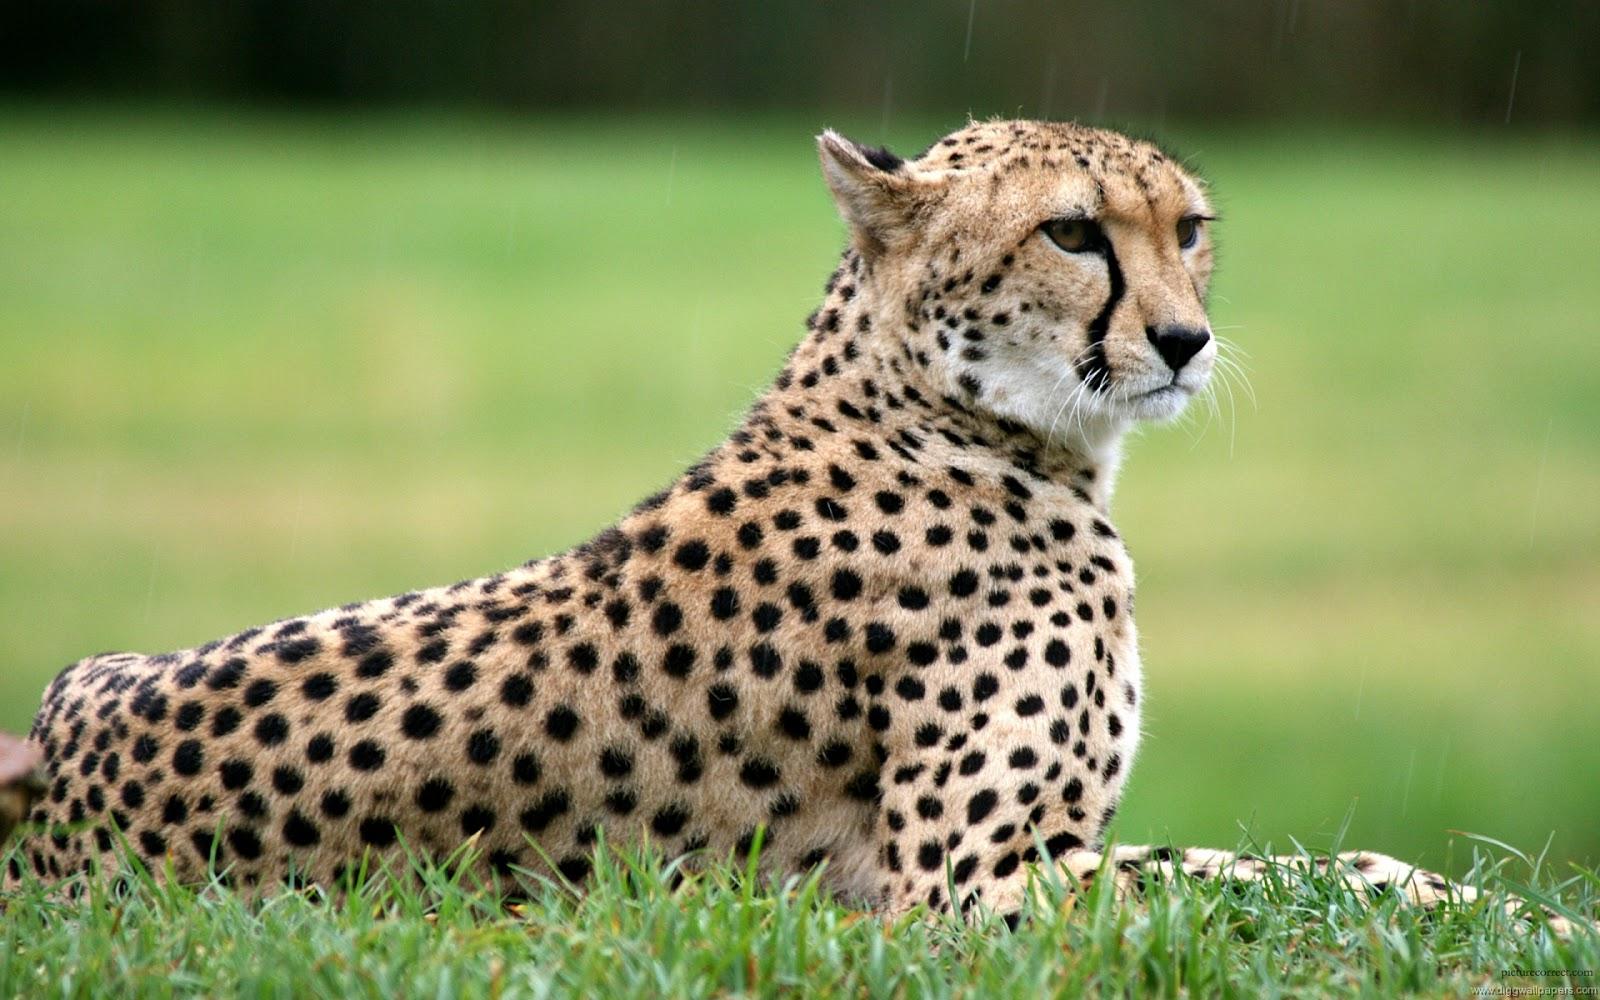 Wildlife Of The World Cheetah Wallpapers Desktop 2012 HD Wallpapers Download Free Images Wallpaper [1000image.com]